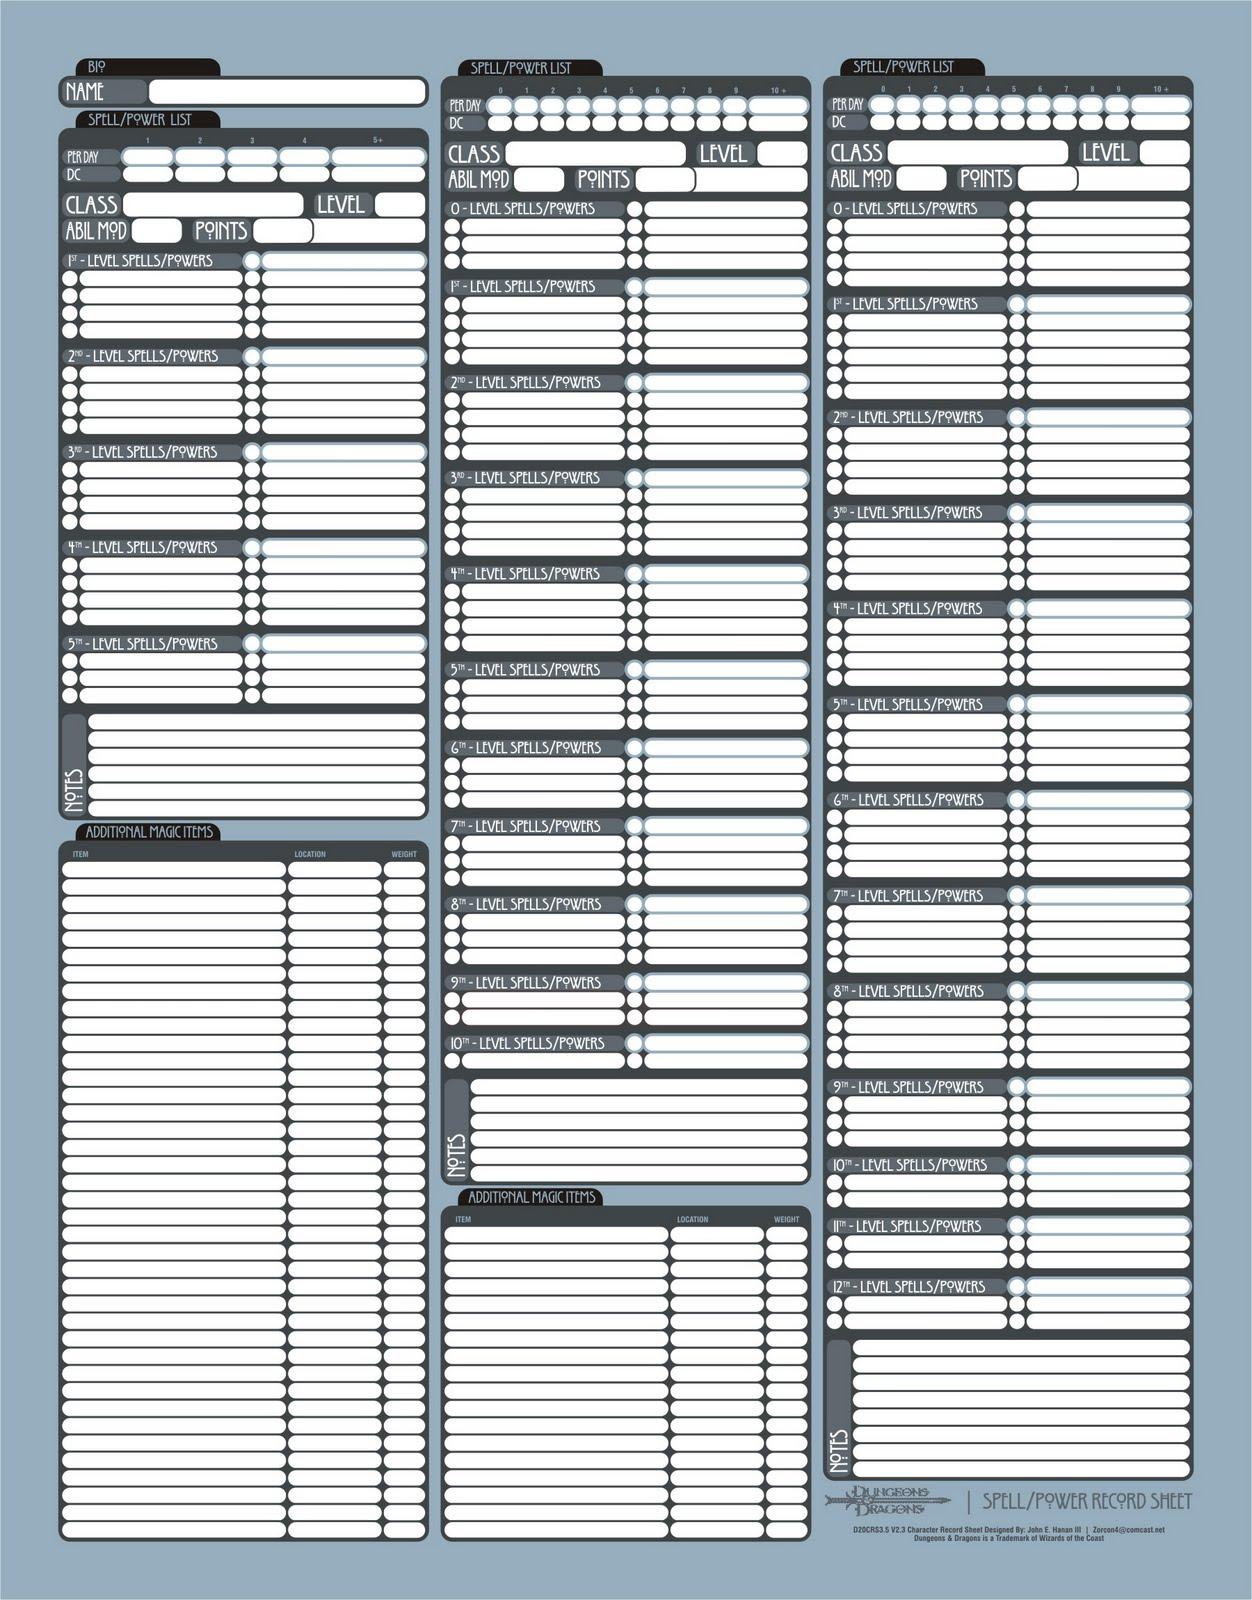 dnd handbook 3.5 pdf